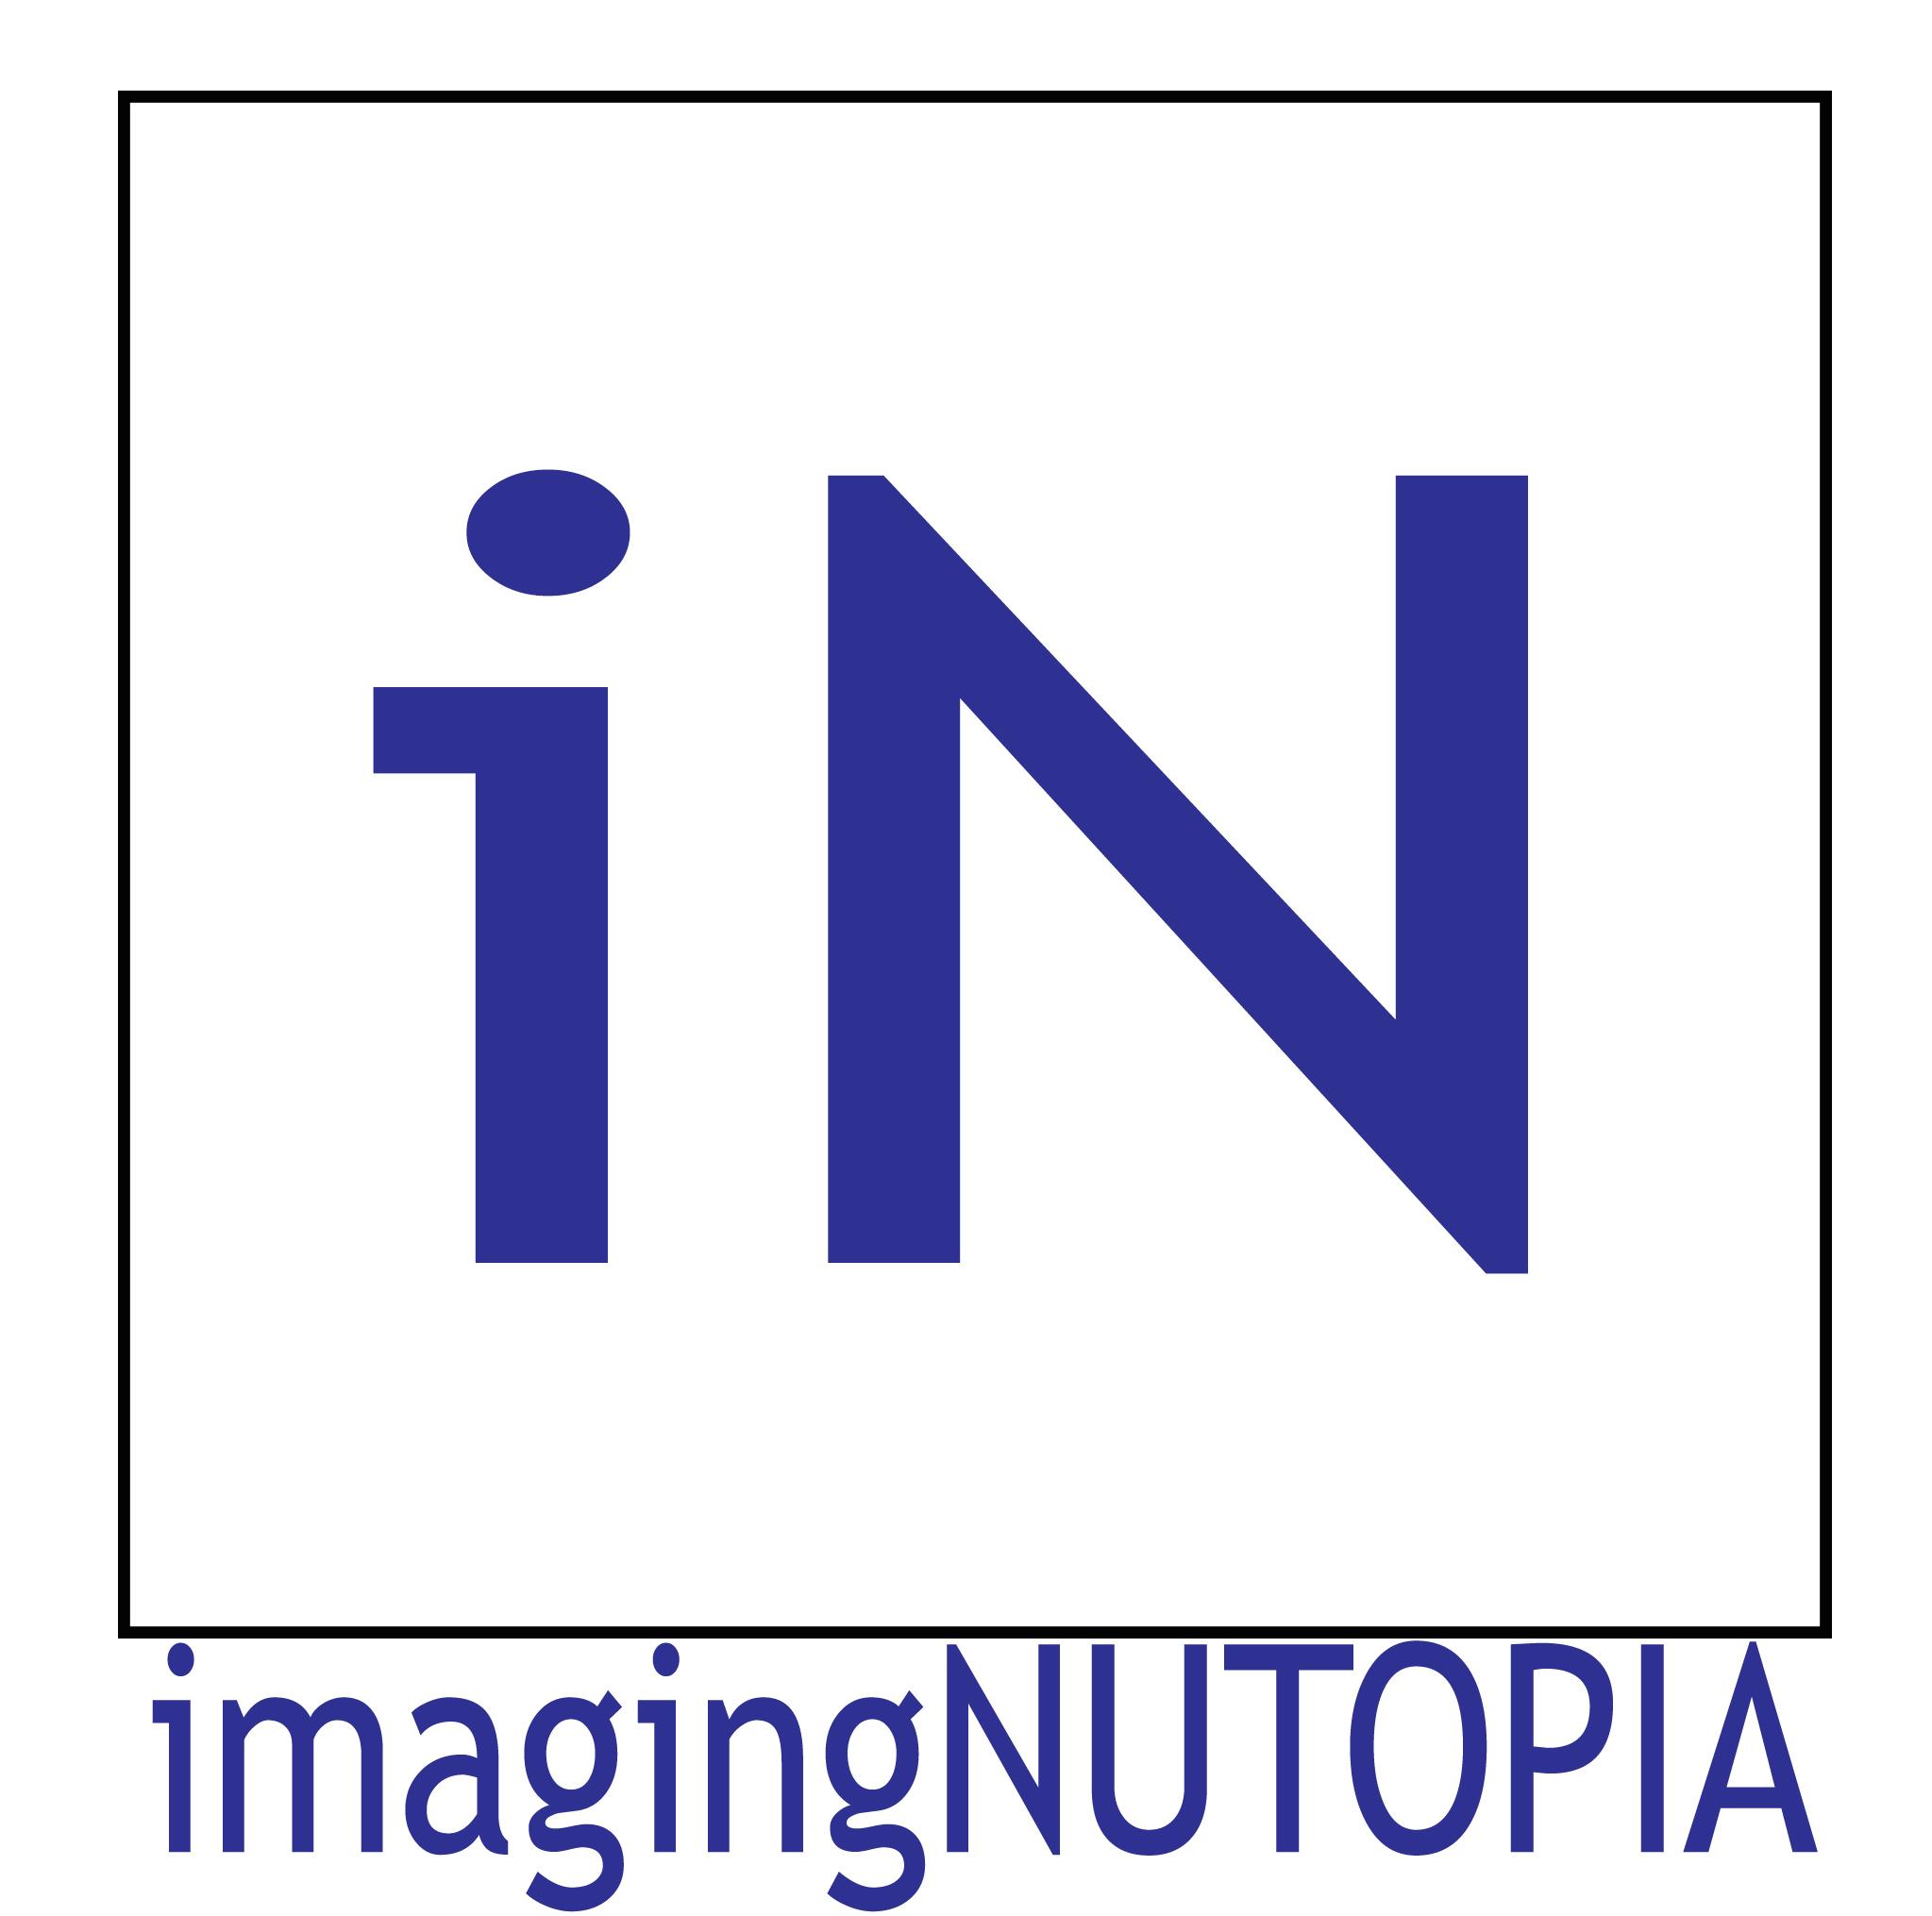 Imaging Nutopia